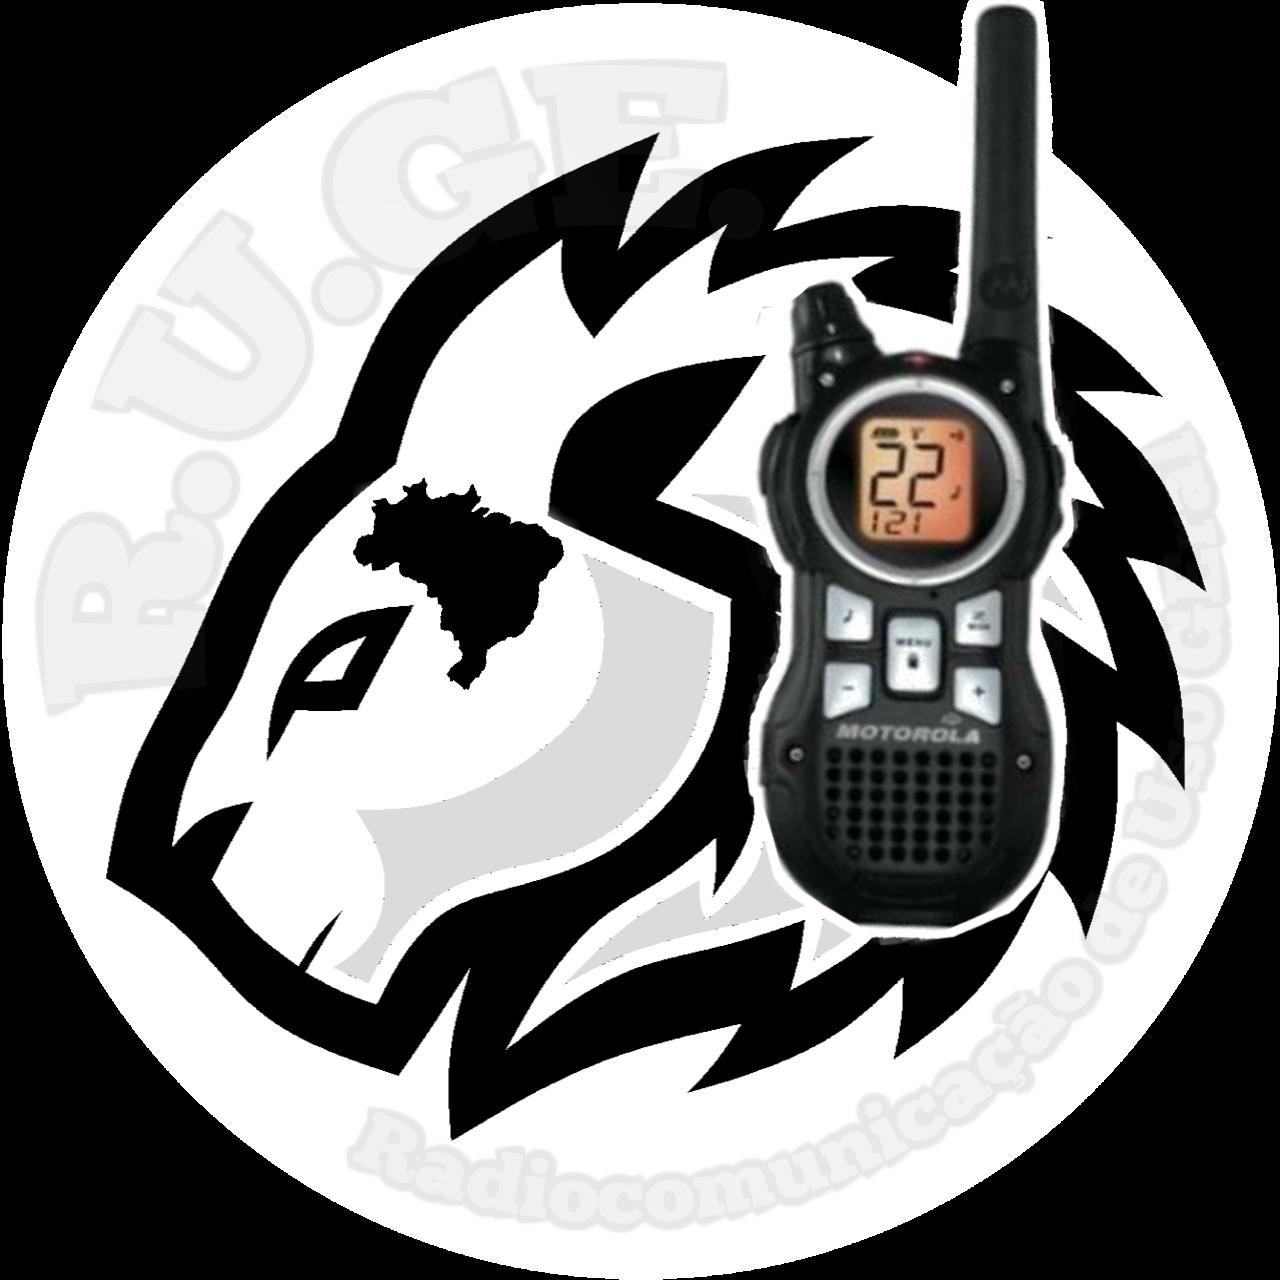 RUGE -Radiocomunicação de Uso GEral (@RugeBrasil)   Twitter